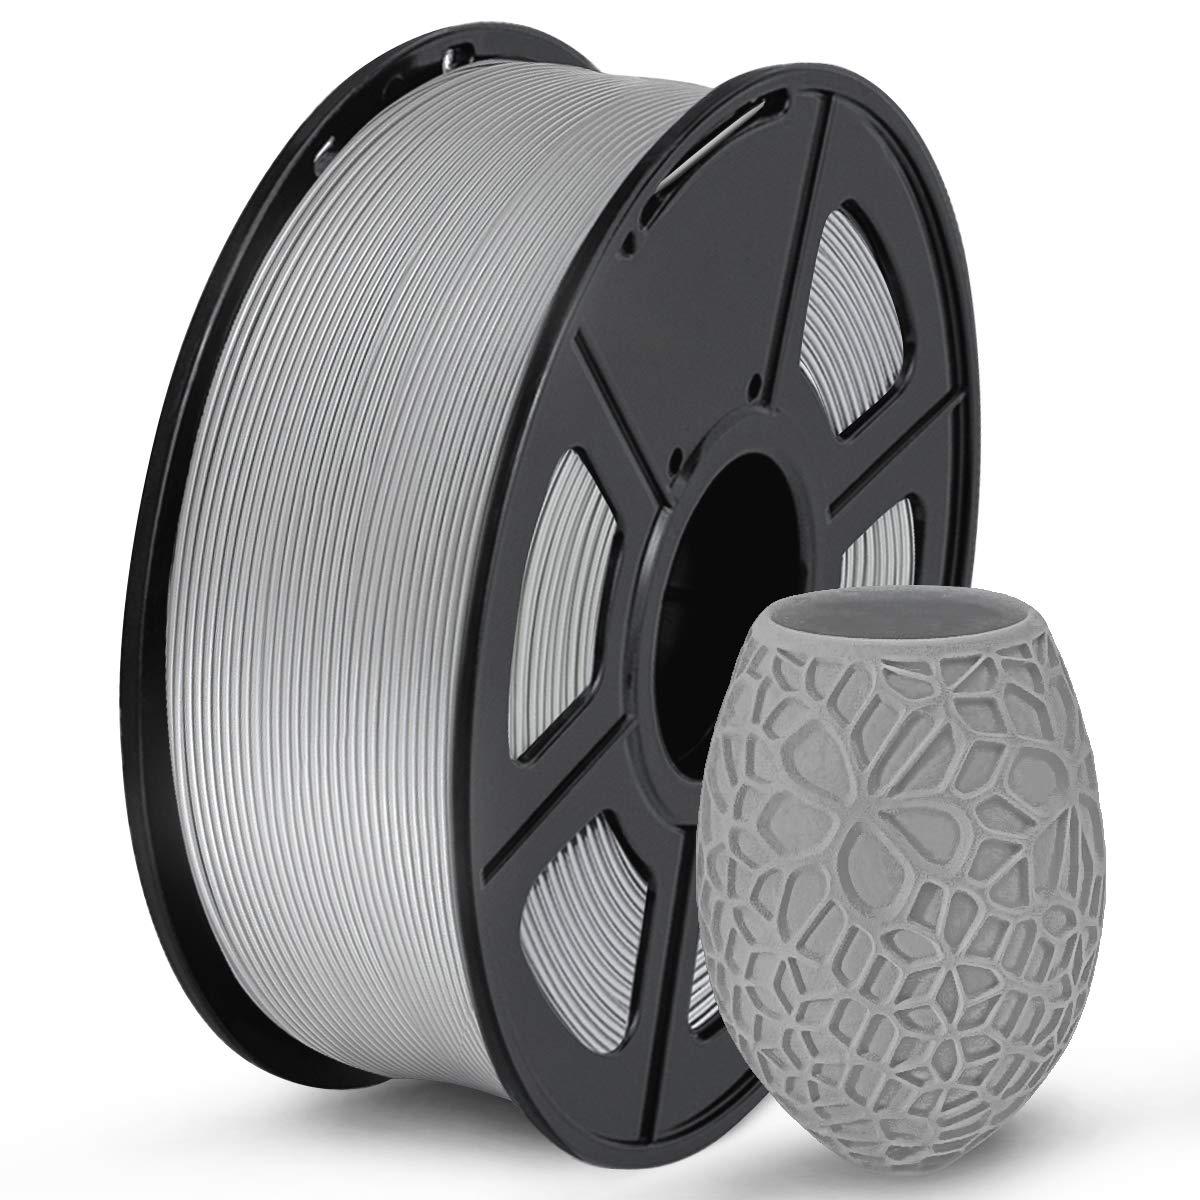 SUNLU PLA 3D Printer Filament, PLA Filament 1.75mm Dimensional Accuracy +/- 0.02 mm, 1 KG Spool, PLA Gray